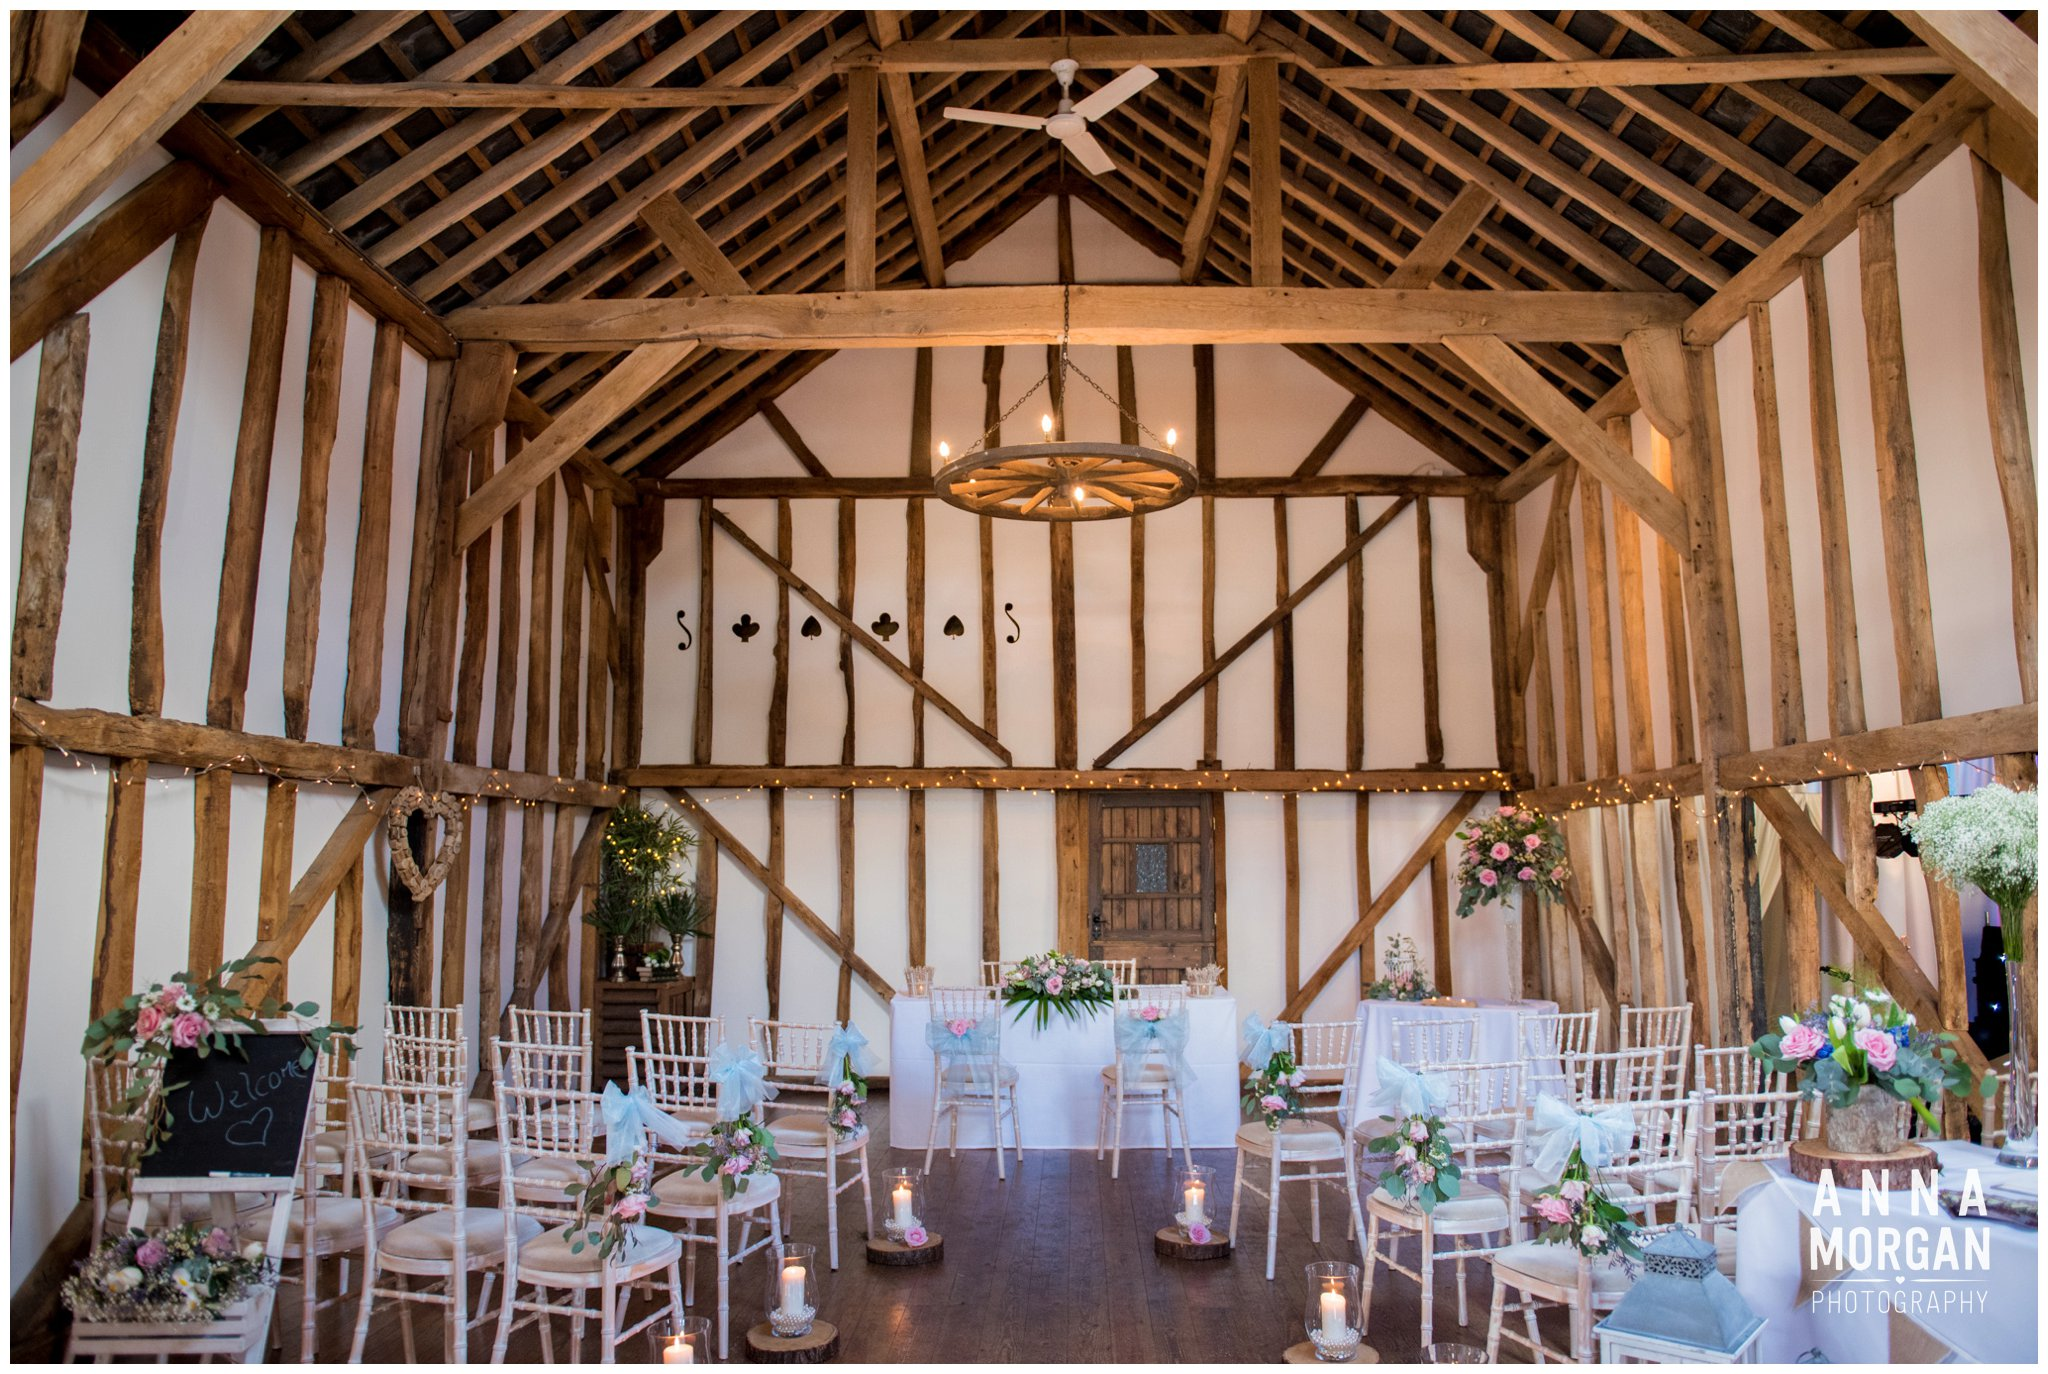 Pitt Hall Barn 2016 Spring Open Day - Hampshire Wedding ...